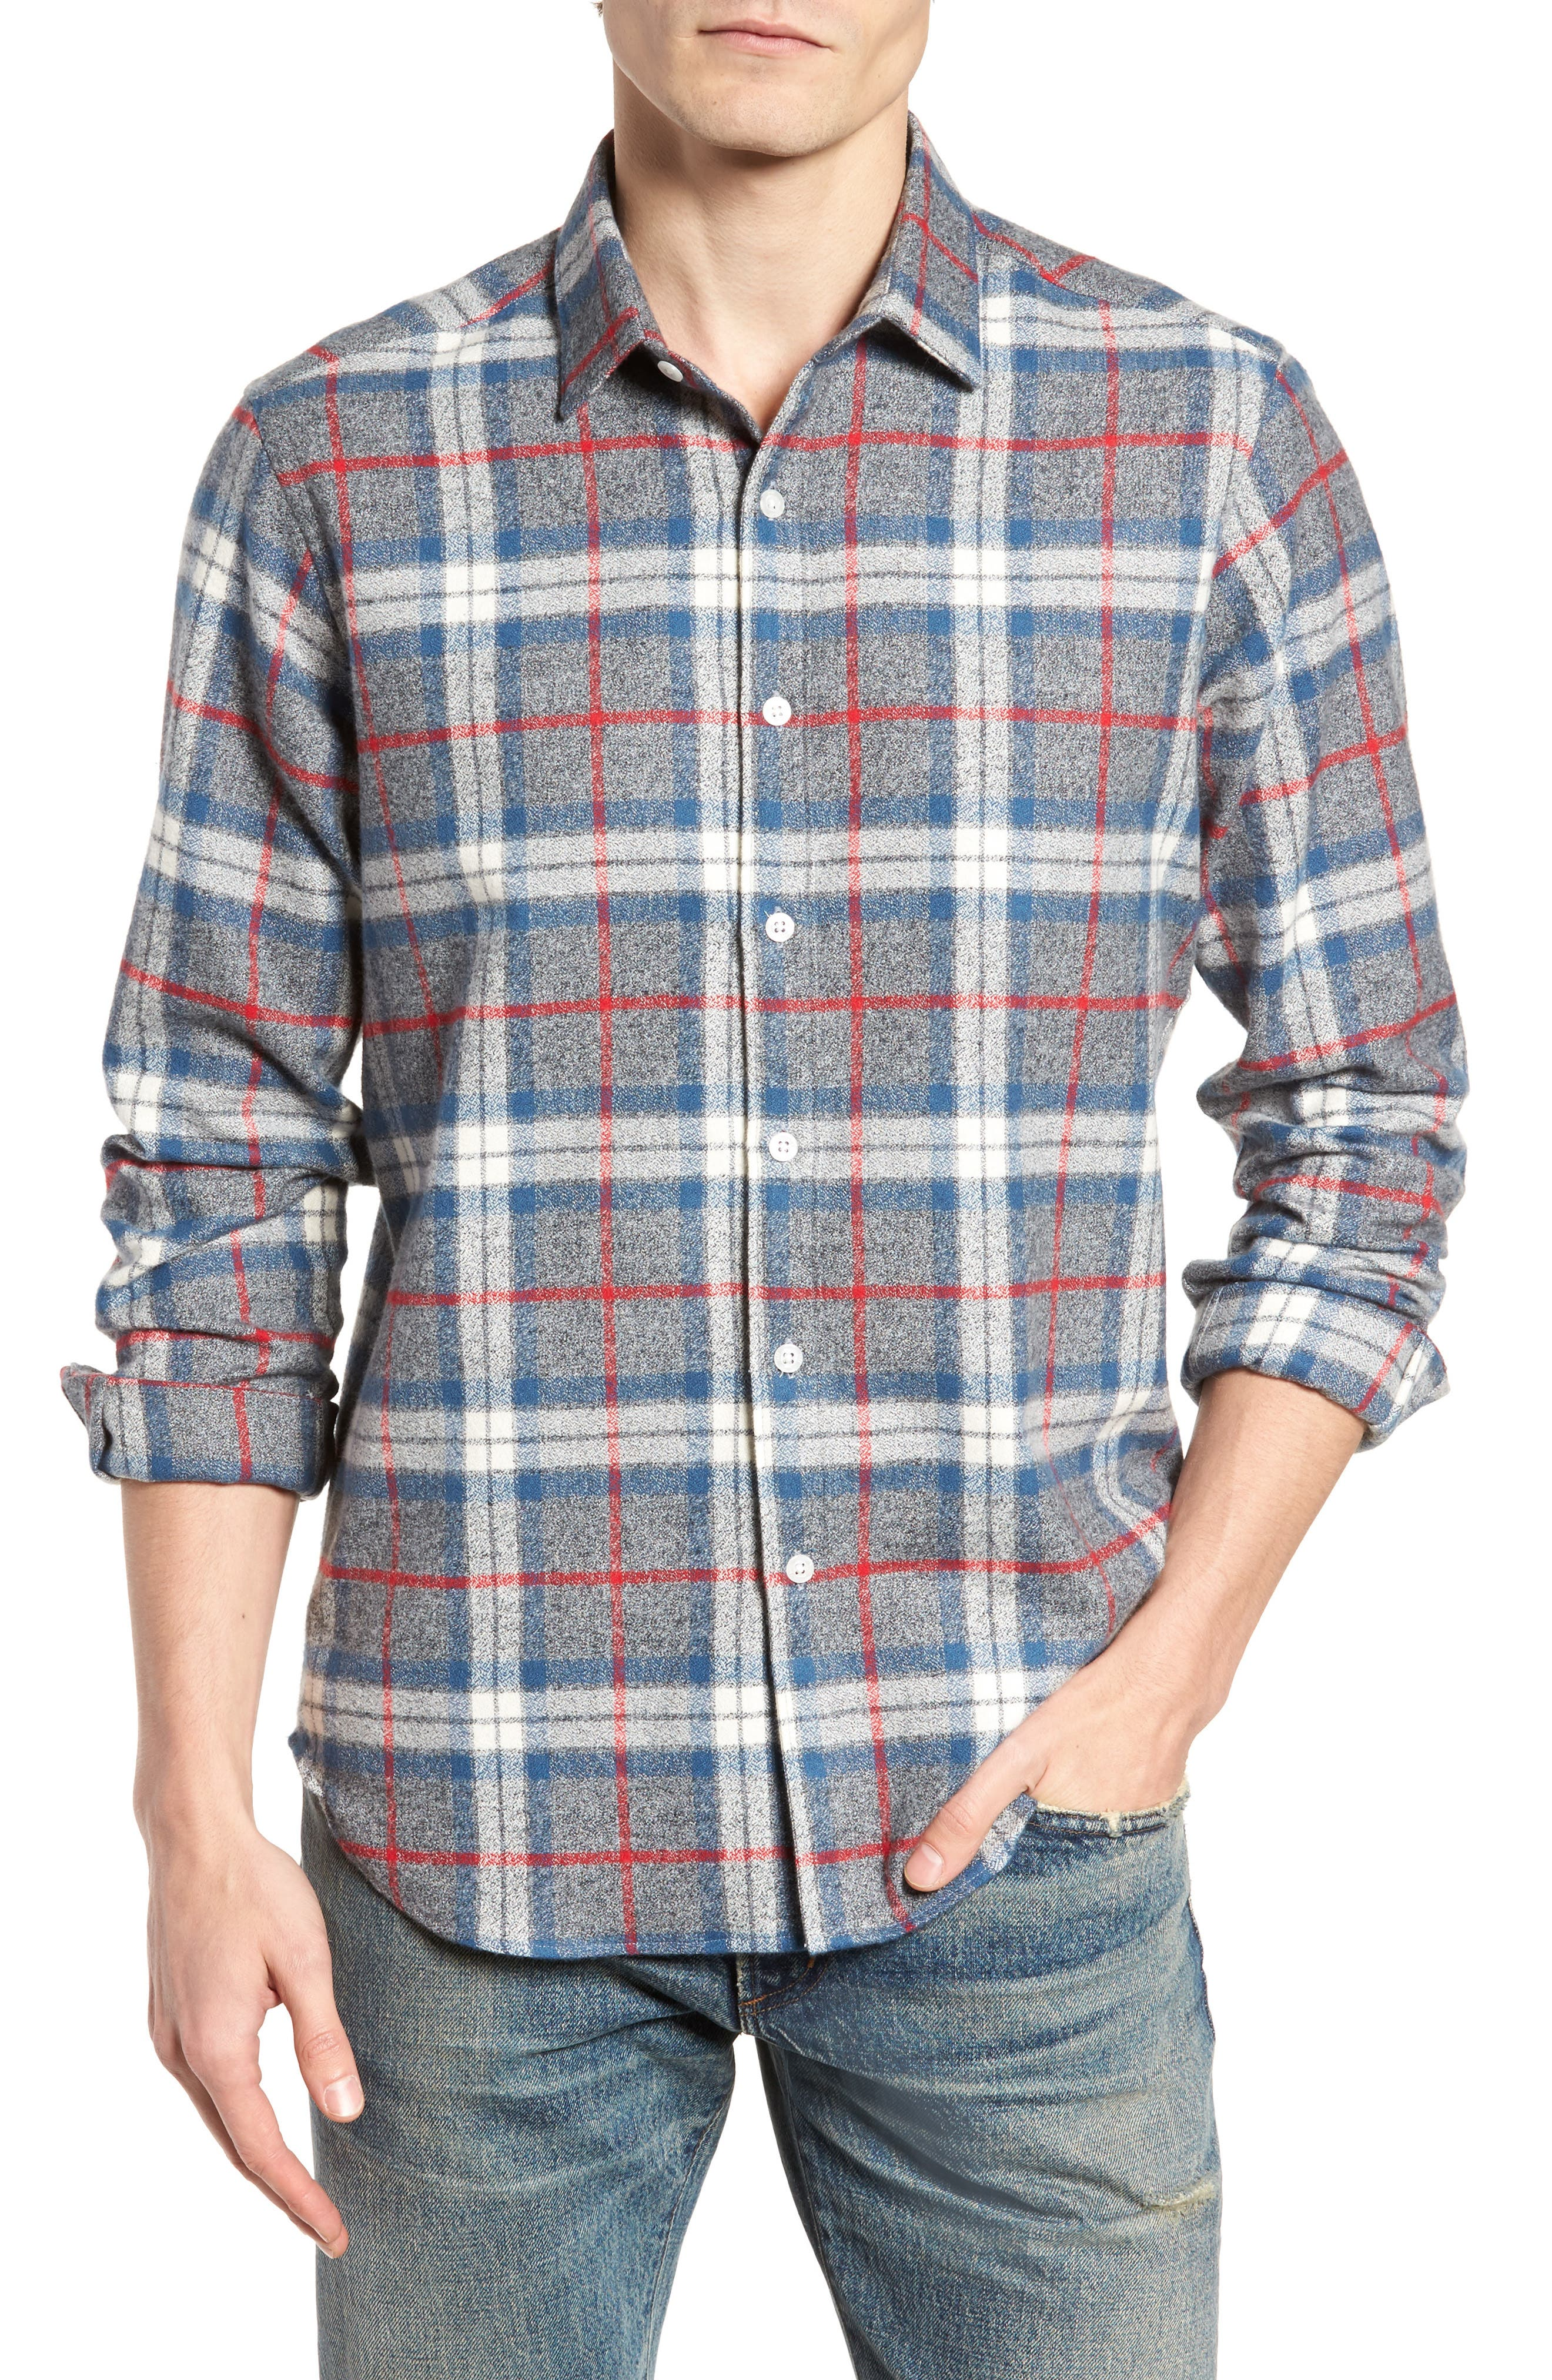 Alternate Image 1 Selected - Jeff Brattleb Slim Fit Plaid Sport Shirt